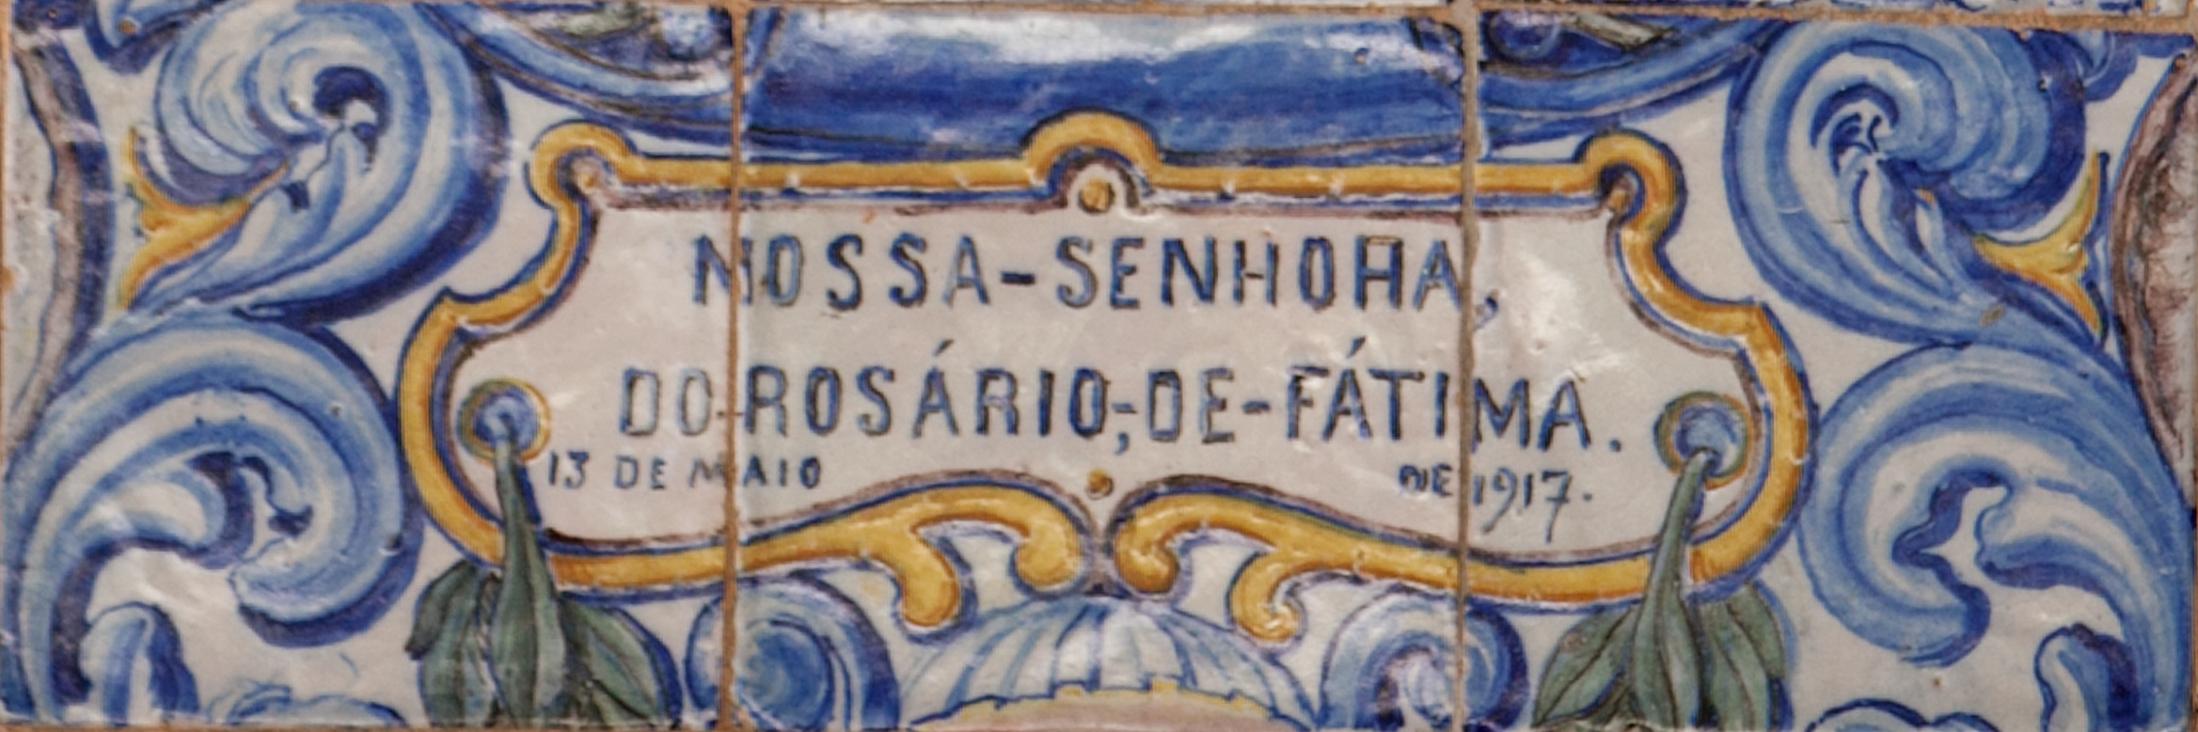 Azulejo da capelinha_Corte 2.jpg